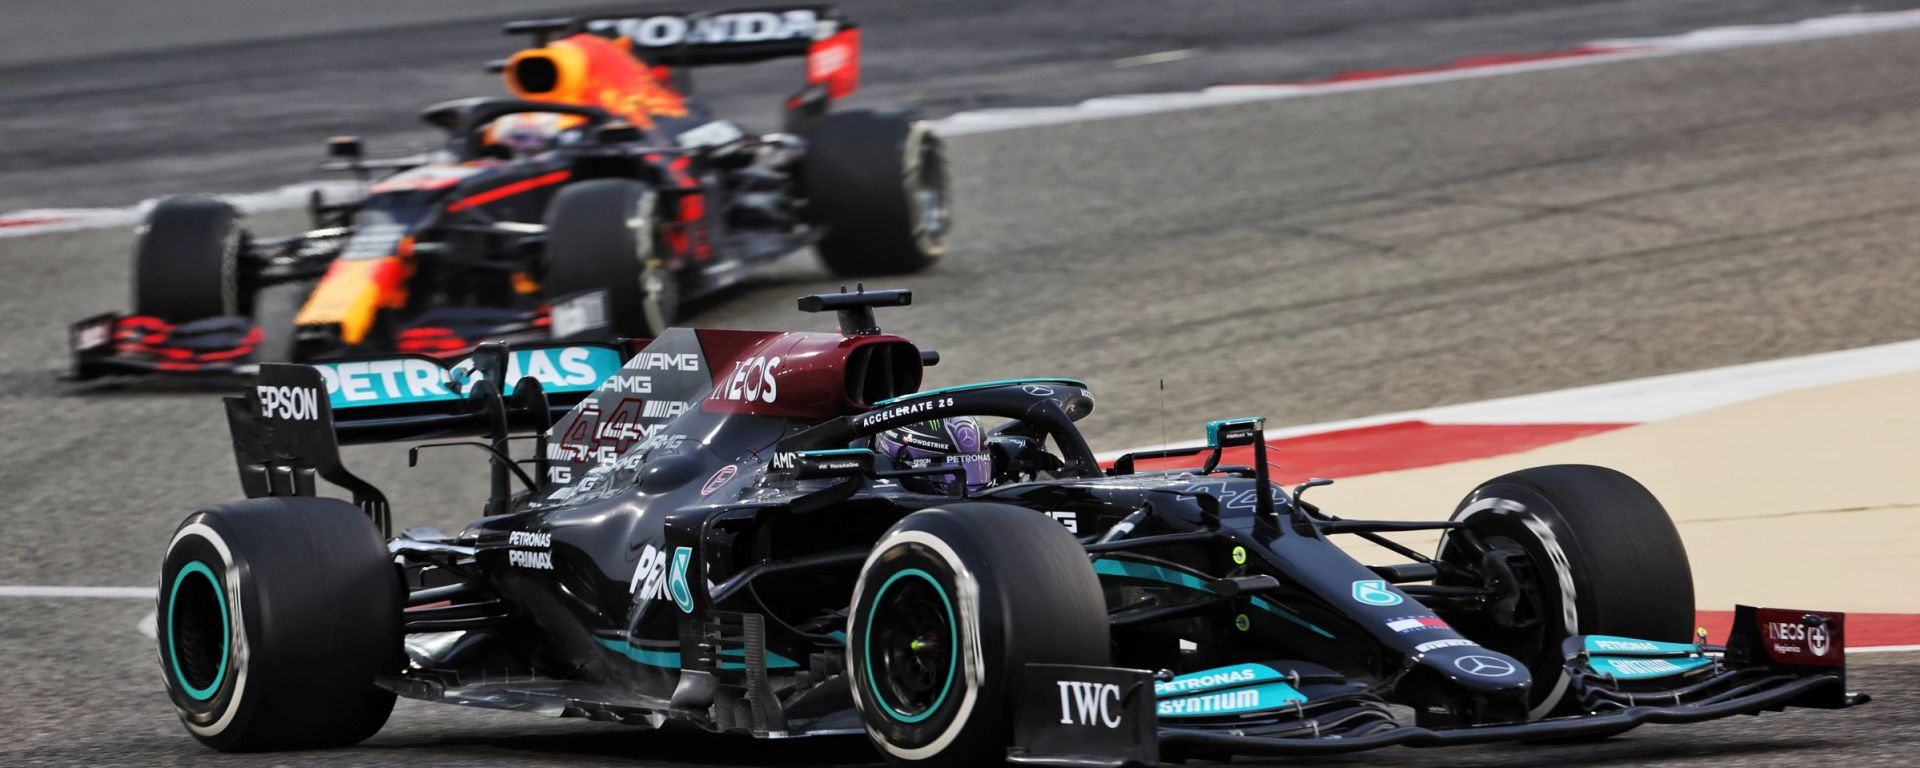 Test F1 2021: Lewis Hamilton (Mercedes) precede la Red Bull